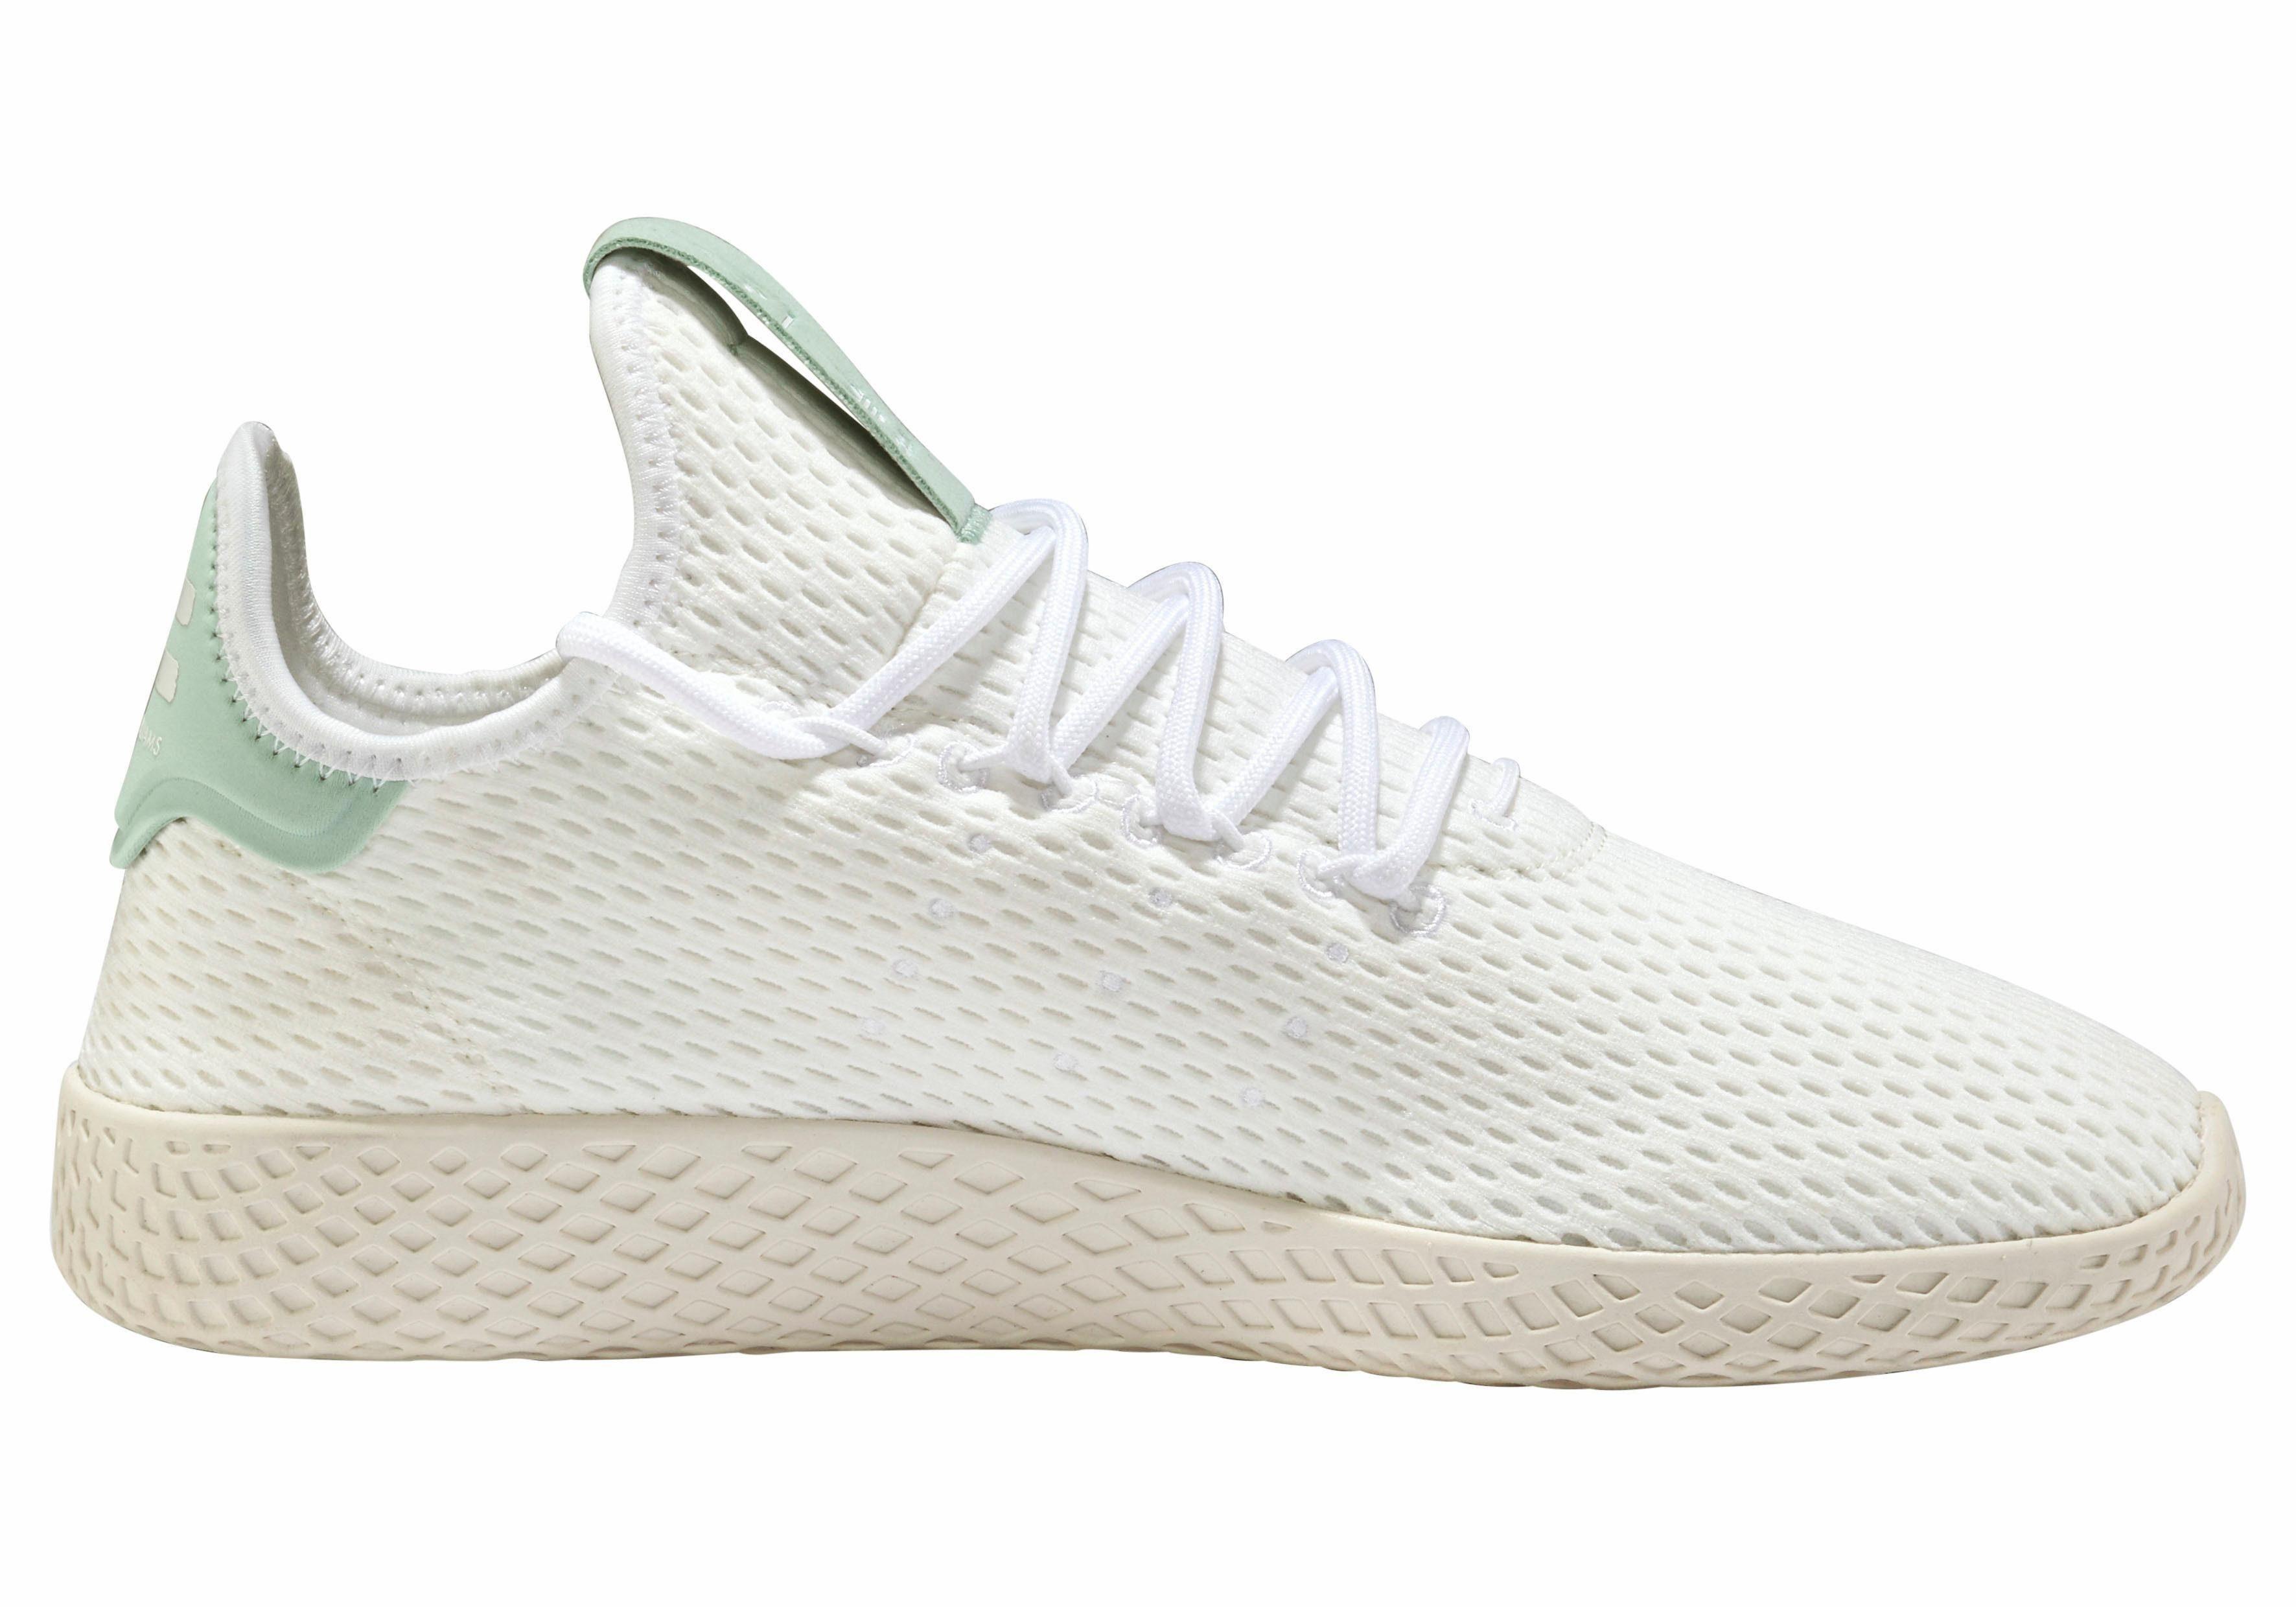 adidas Originals online PW Tennis HU Sneaker, Pharrell Williams online Originals kaufen  weiß-grün f4753e